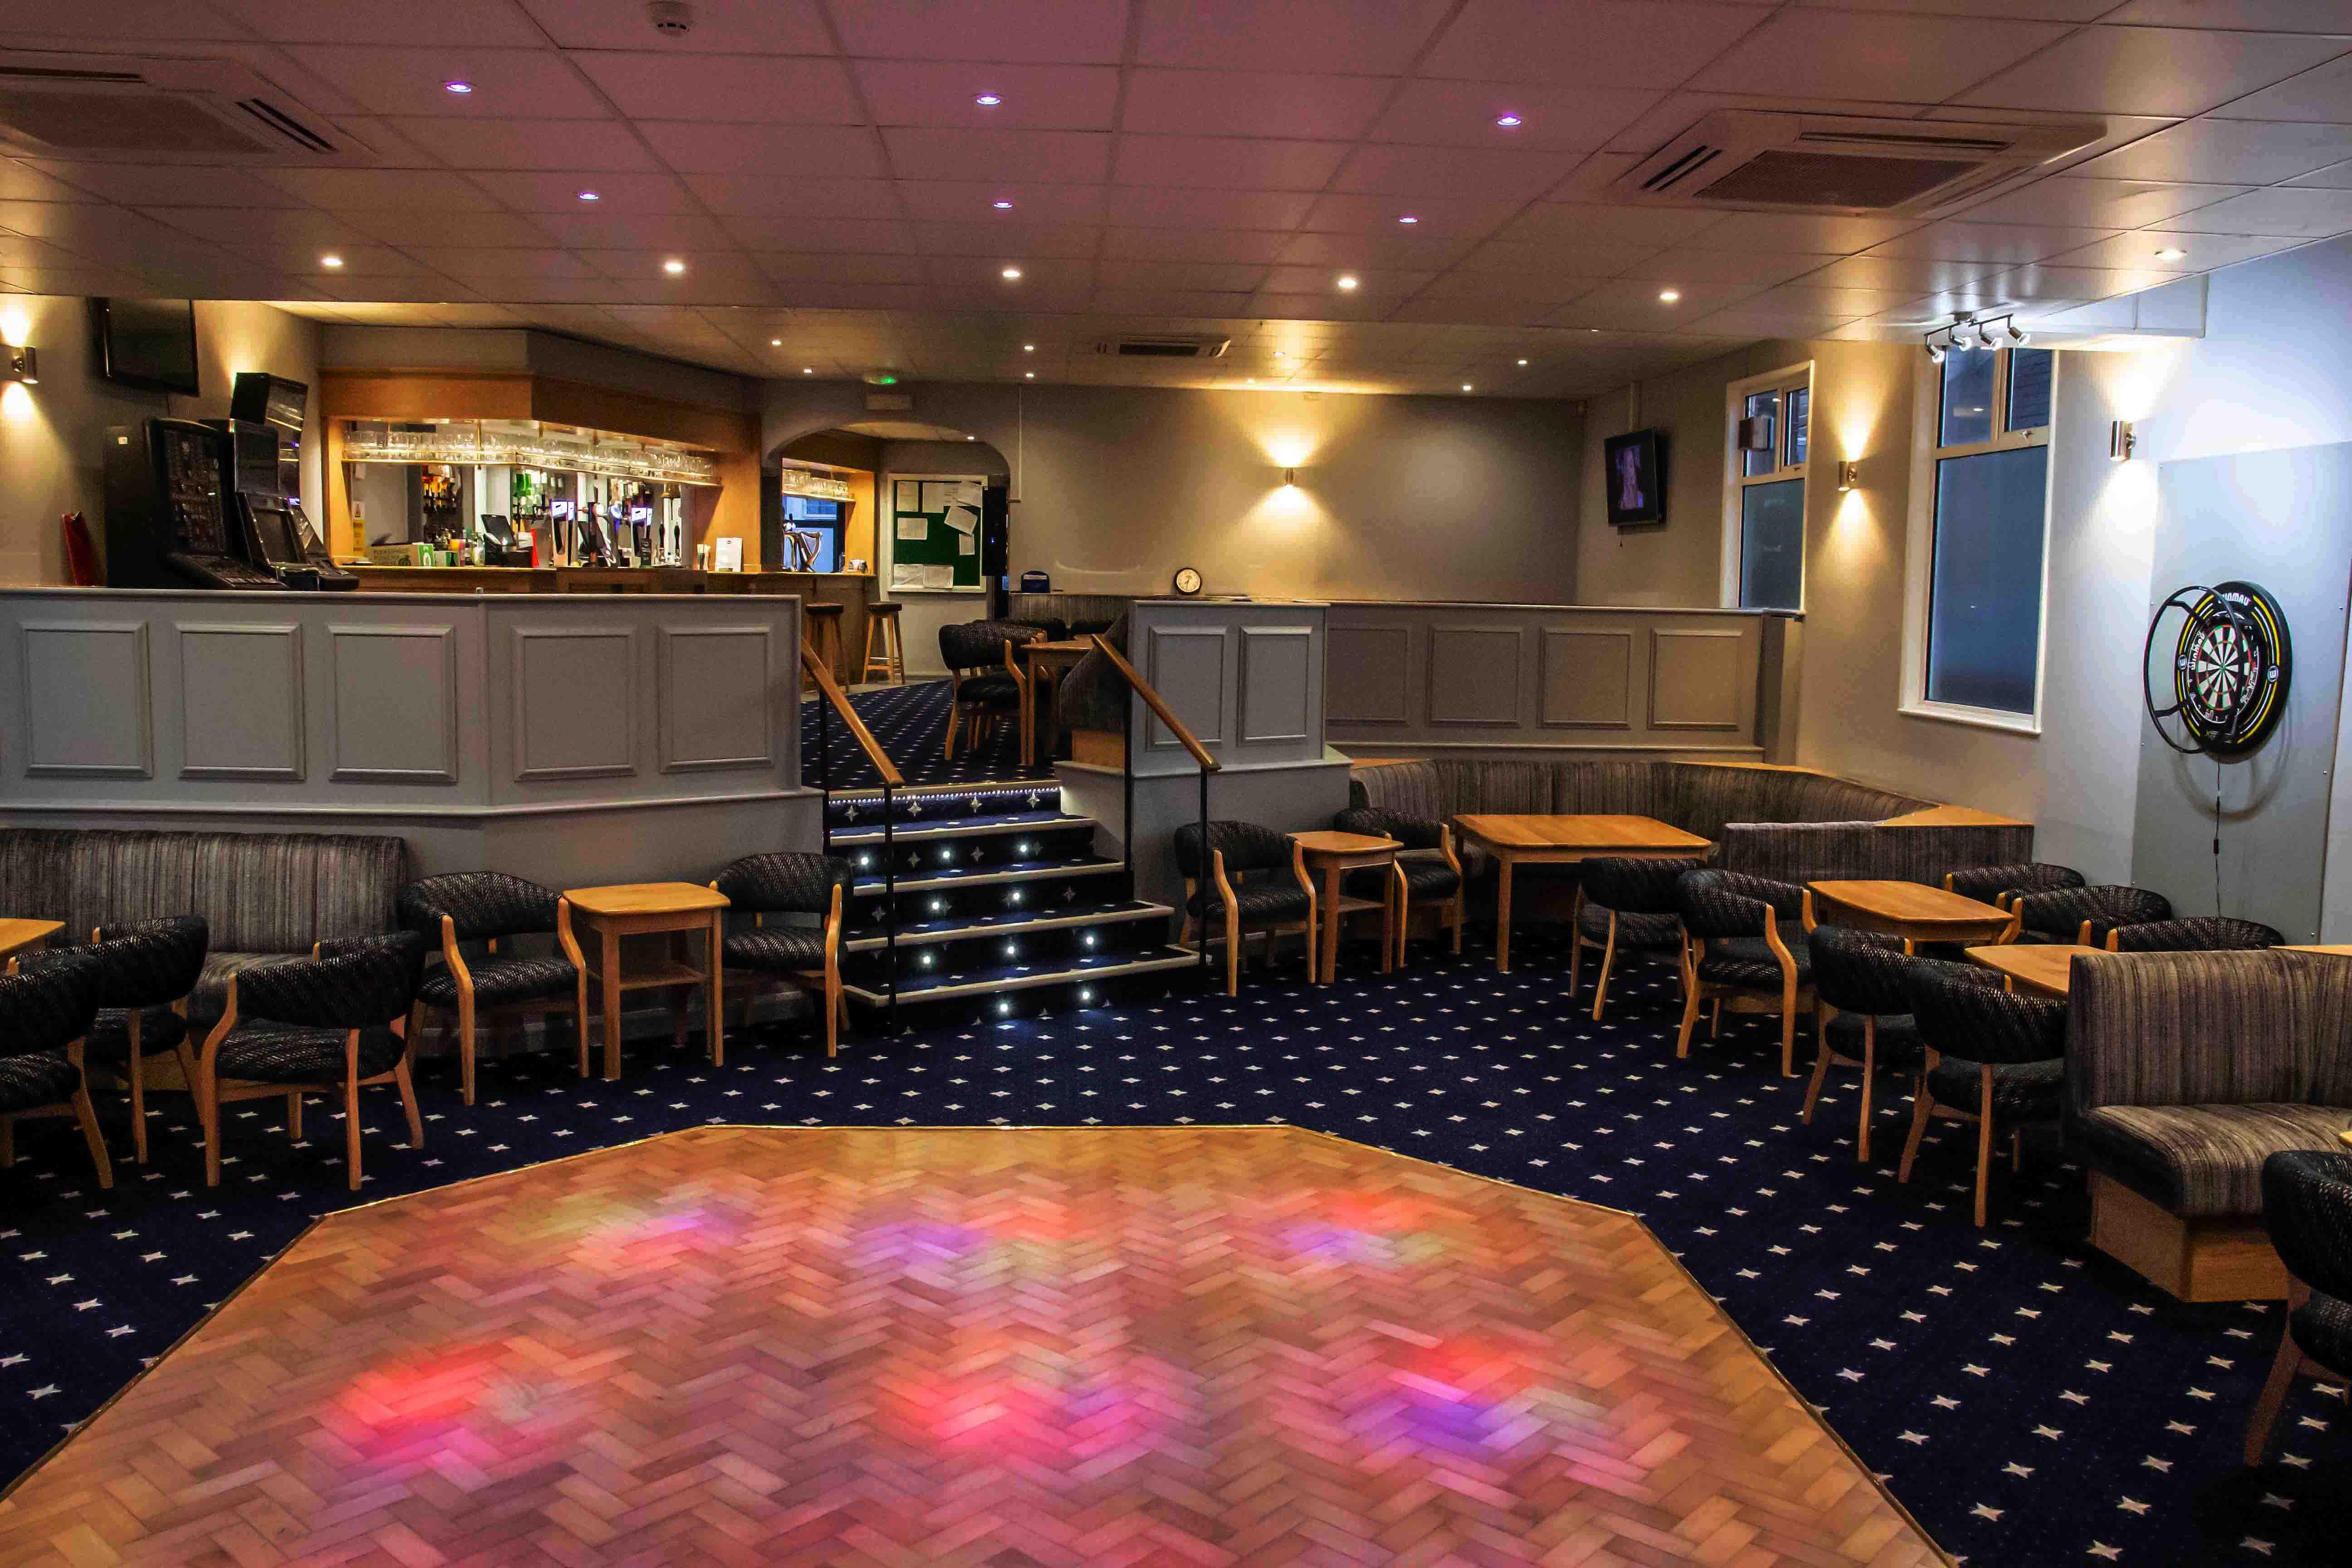 The South Croydon Conservative Club